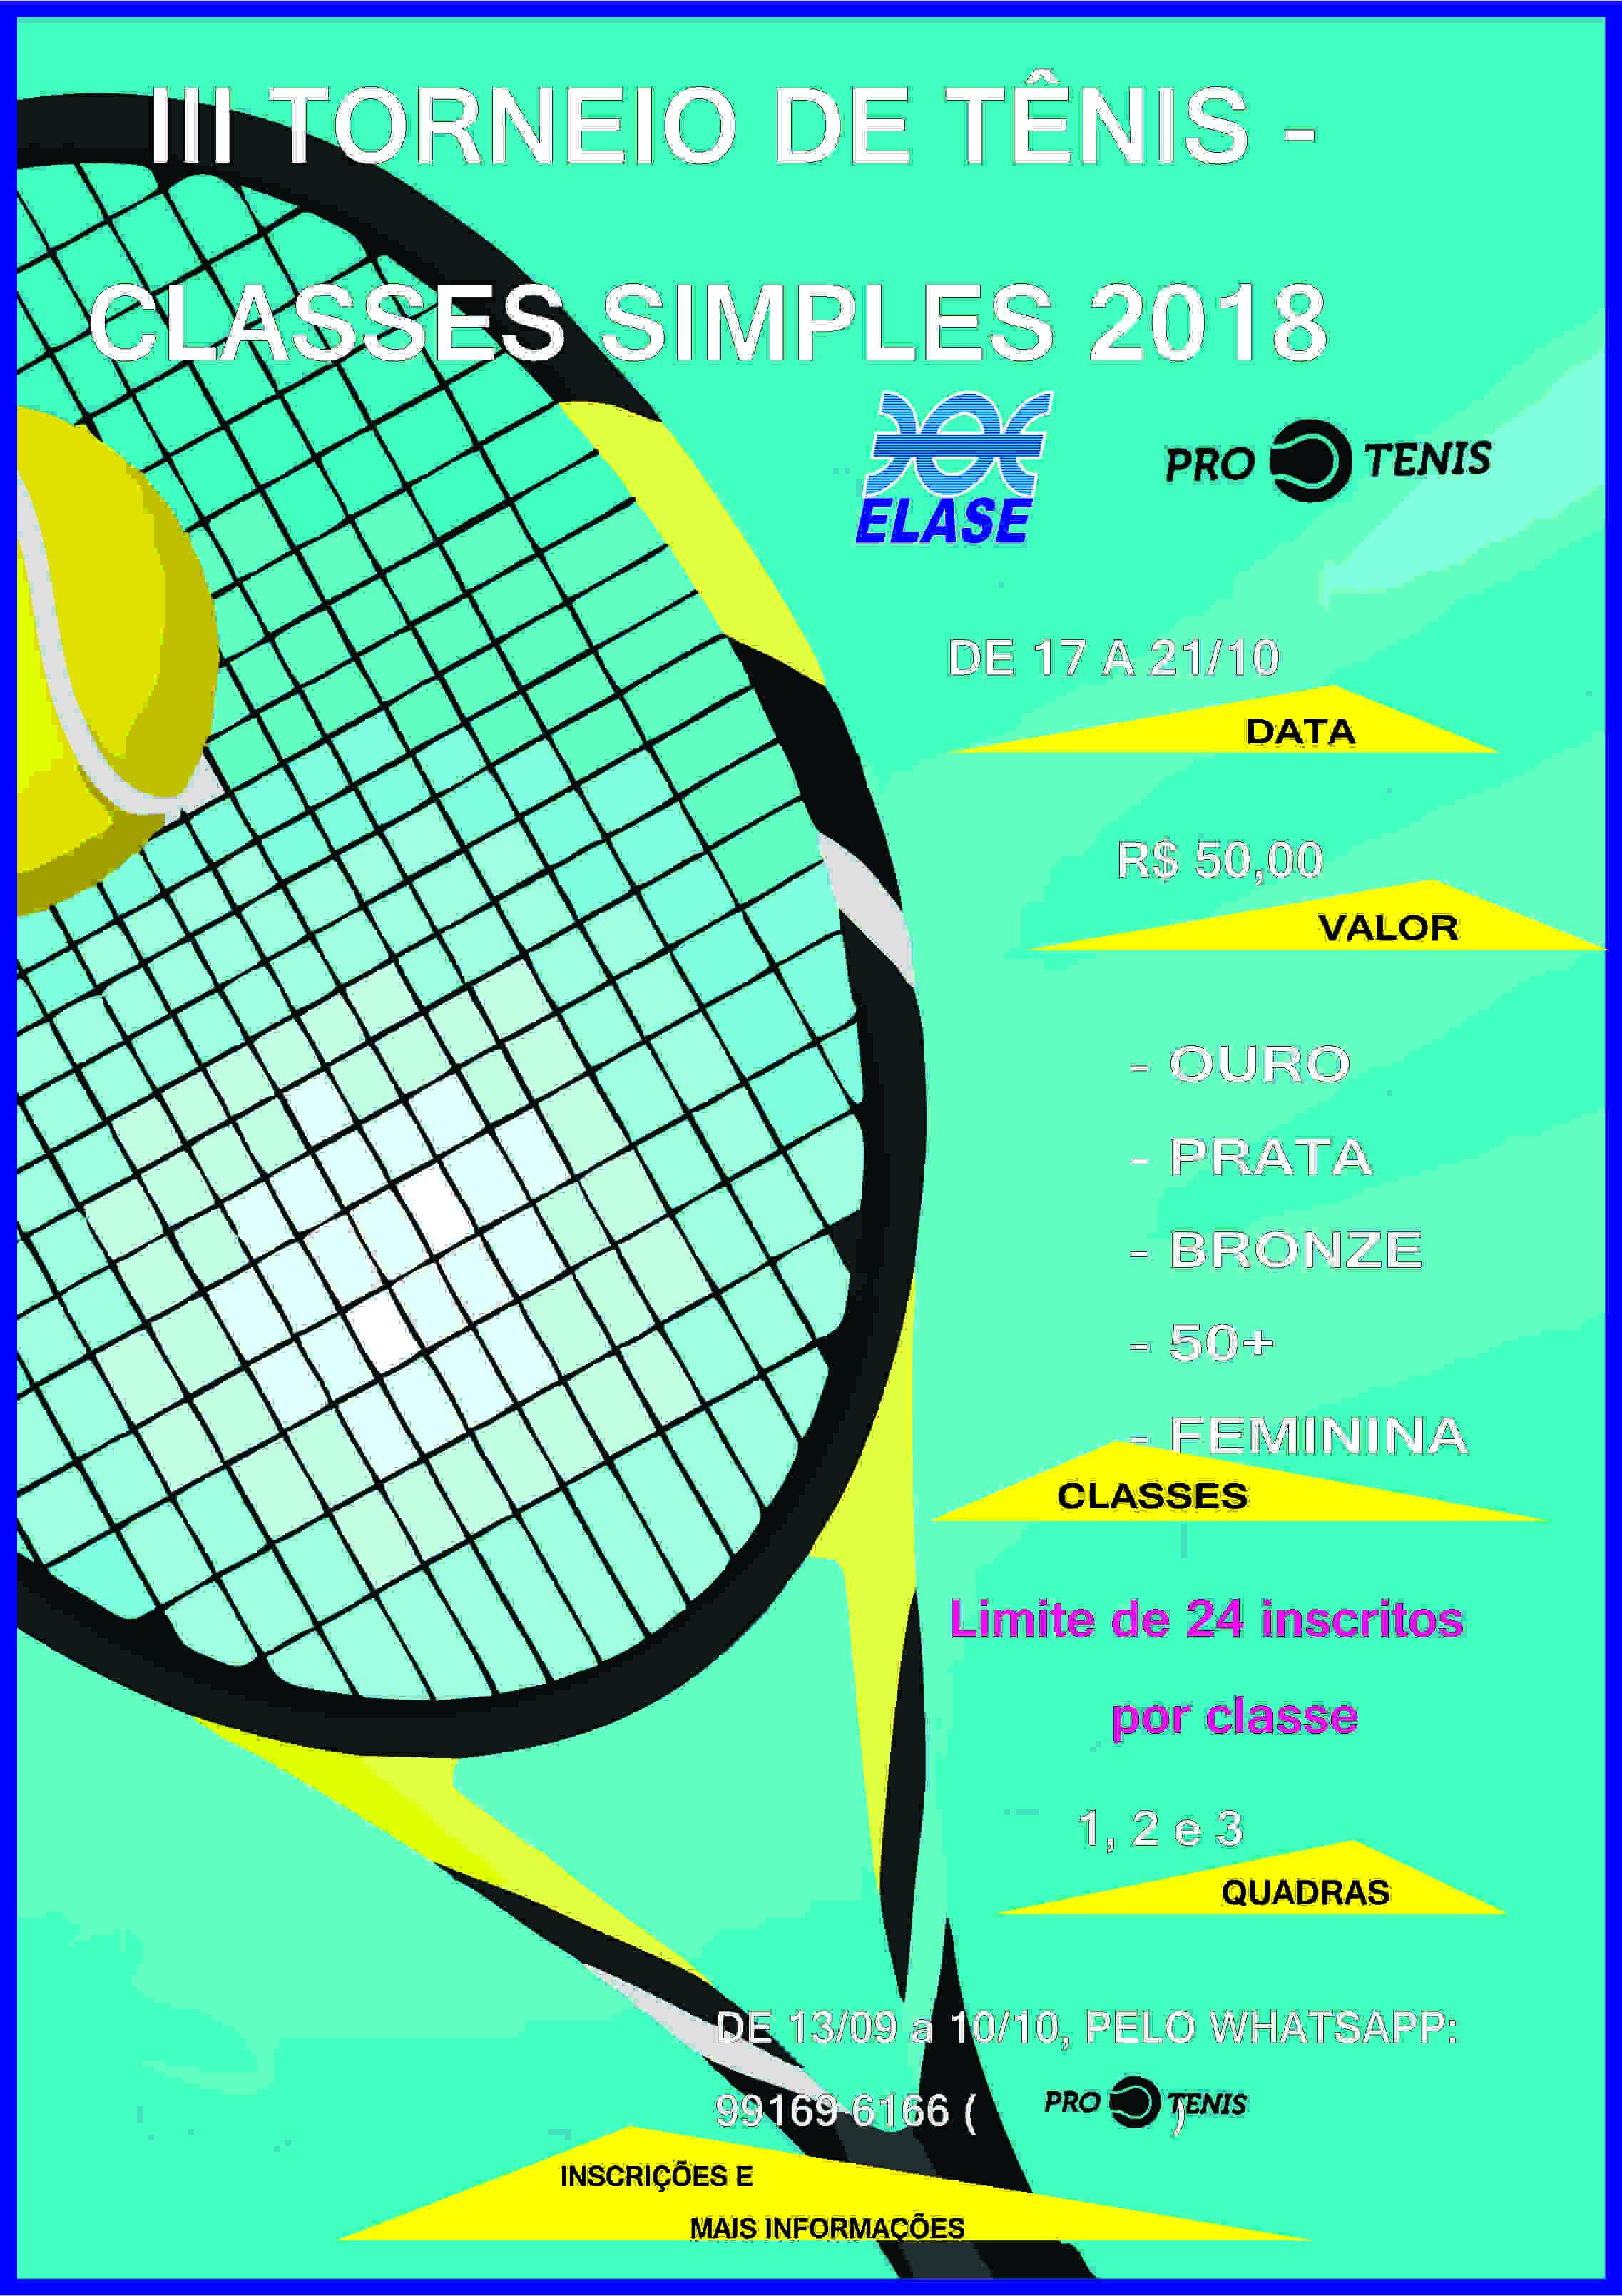 Cartaz II Torneio de Tênis Classes Simples 2018 - Elase 34a7f41d7df7d